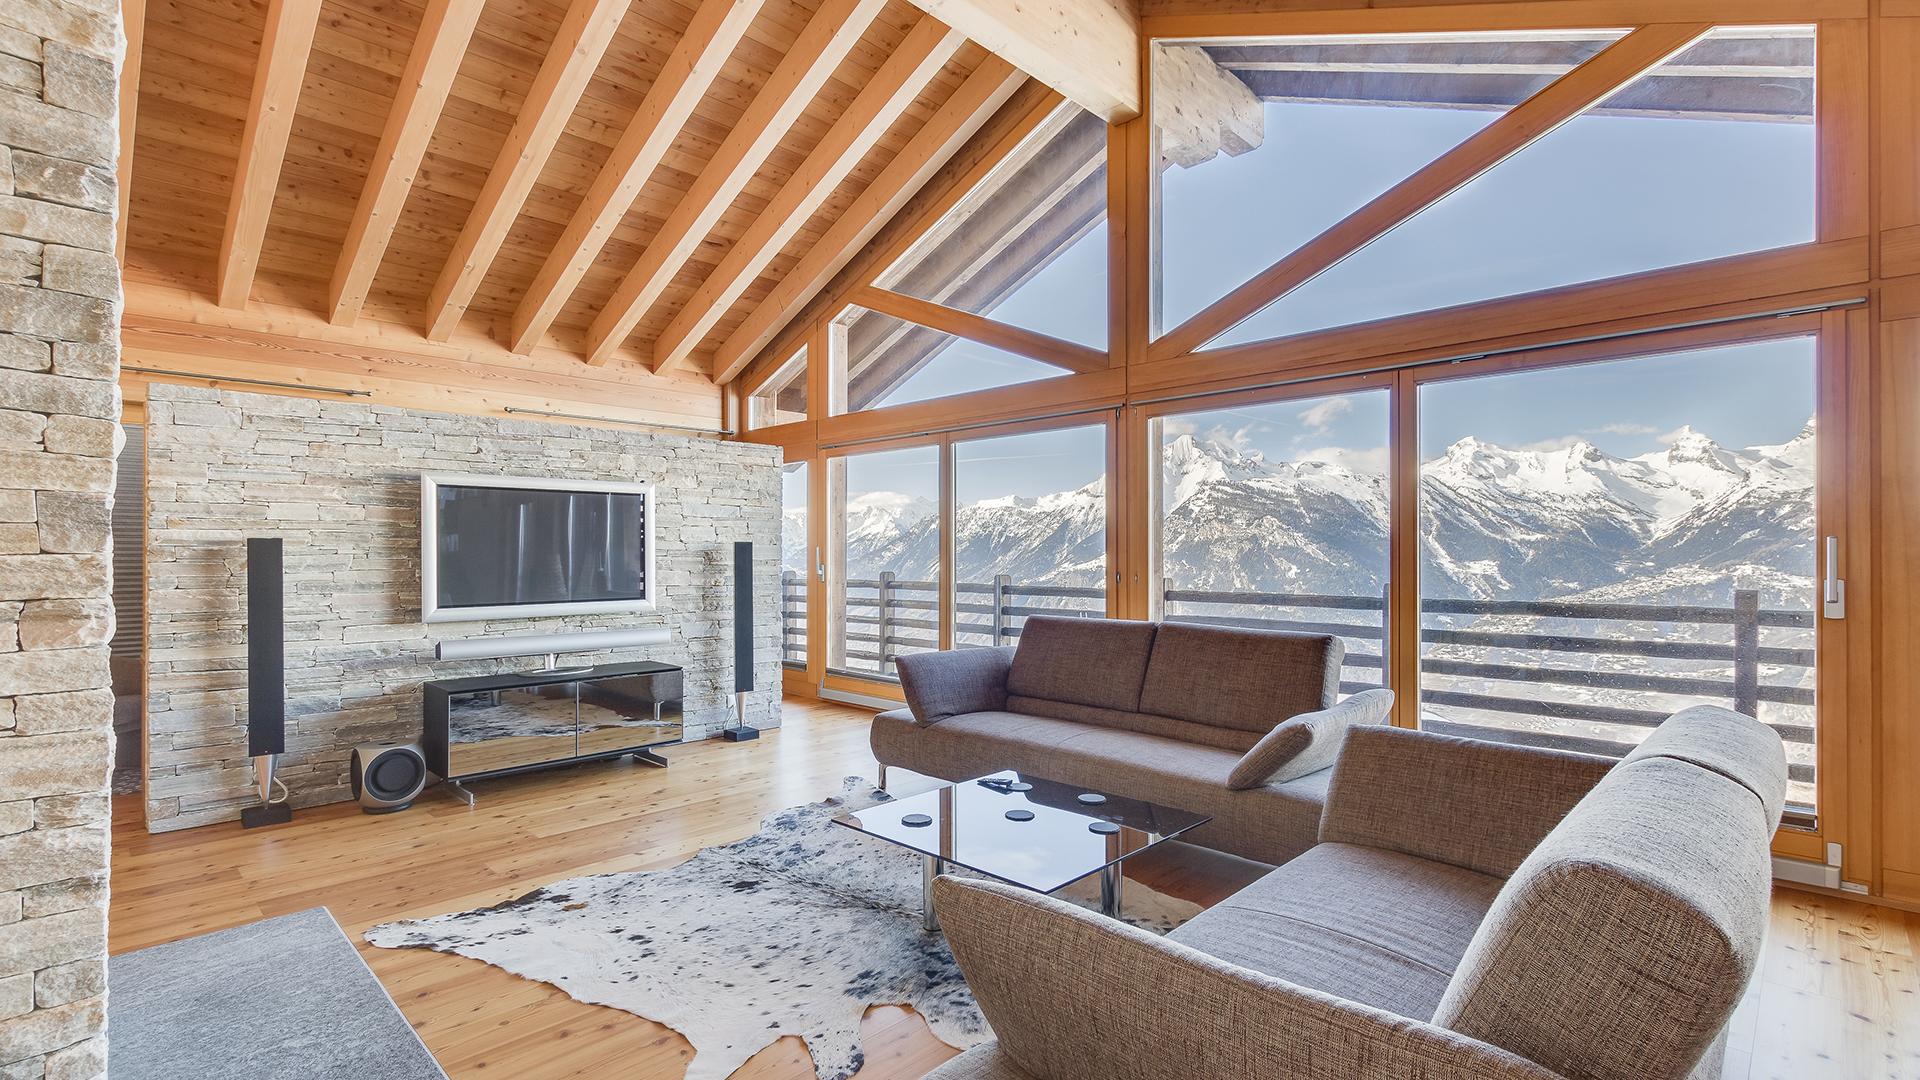 Chalet Le Sapin Chalet, Switzerland